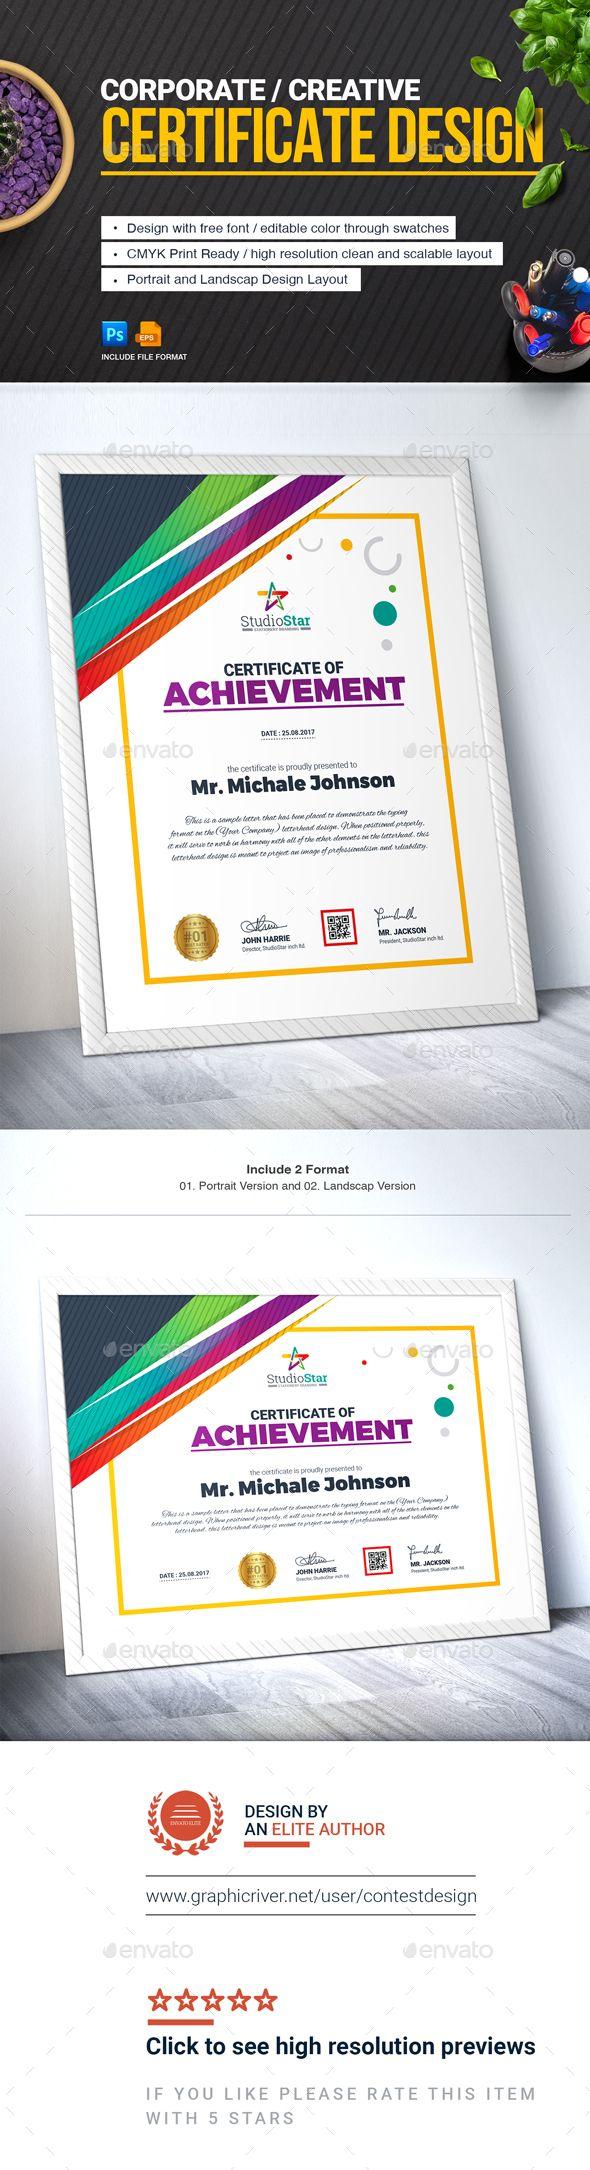 Certificate design template psd vector eps certificate of certificate design template psd vector eps certificate of achievement yelopaper Images